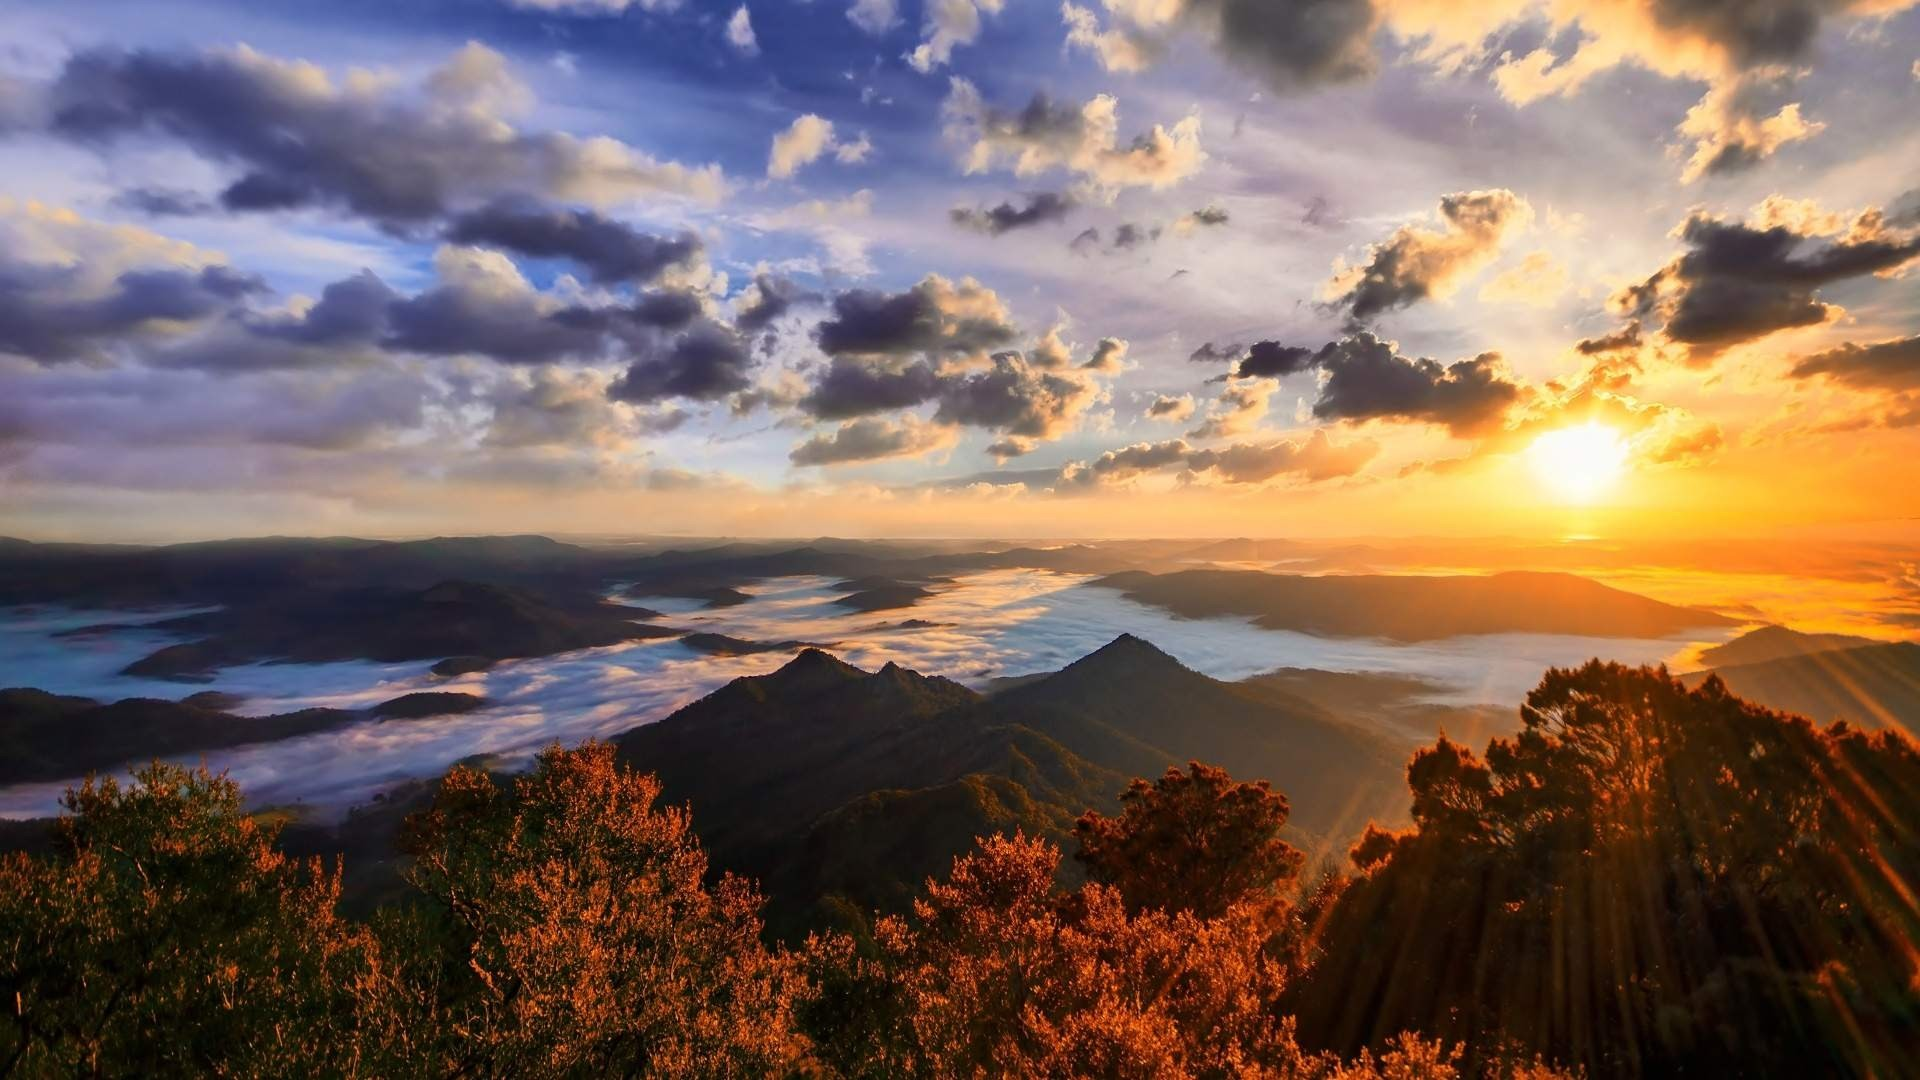 mountain sunset landscape 4k ultra hd wallpaper …